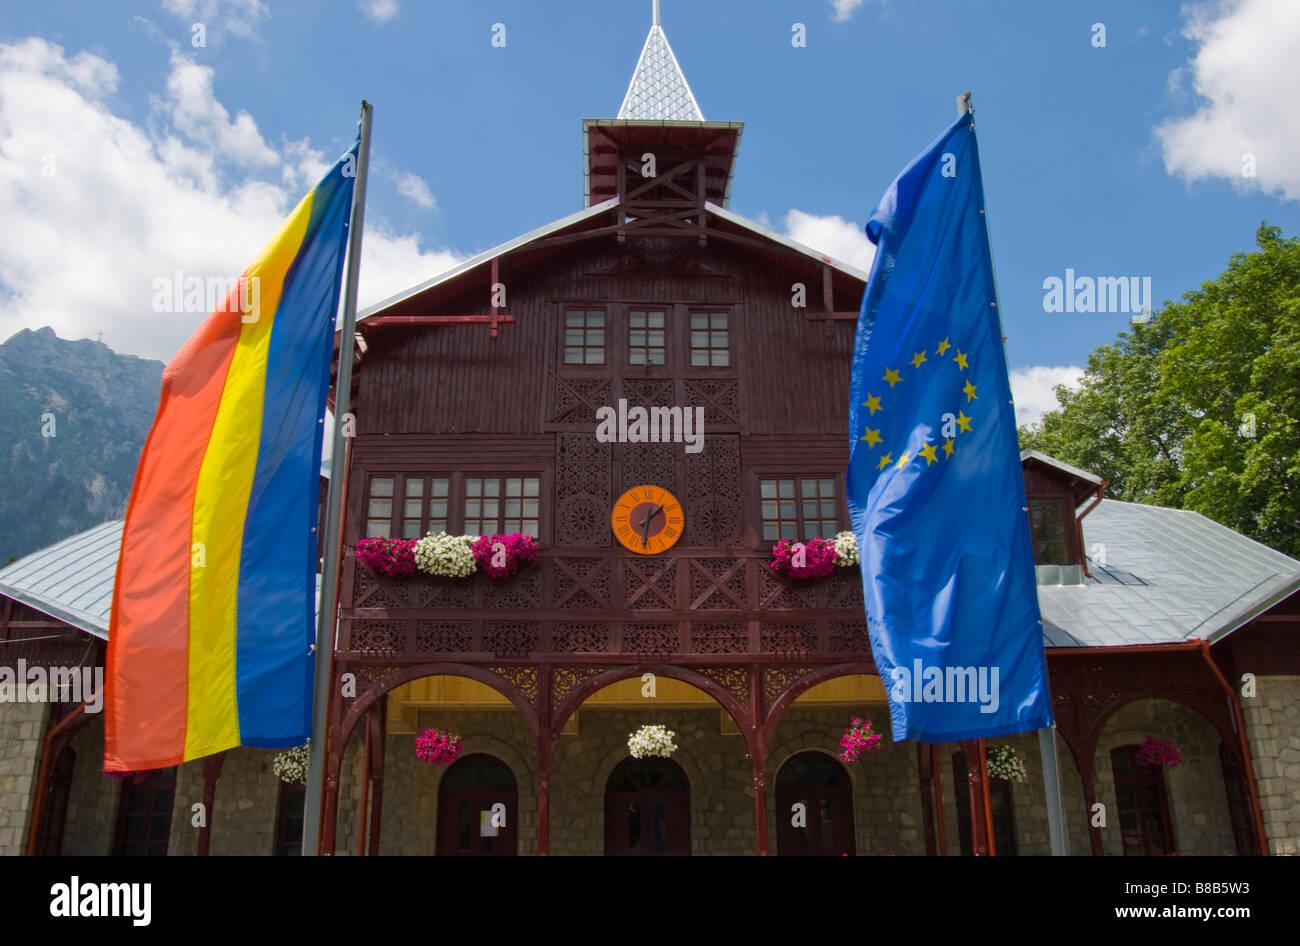 Busteni, Romania, Oraseneasca Library, with Romanian and European Union flags - Stock Image